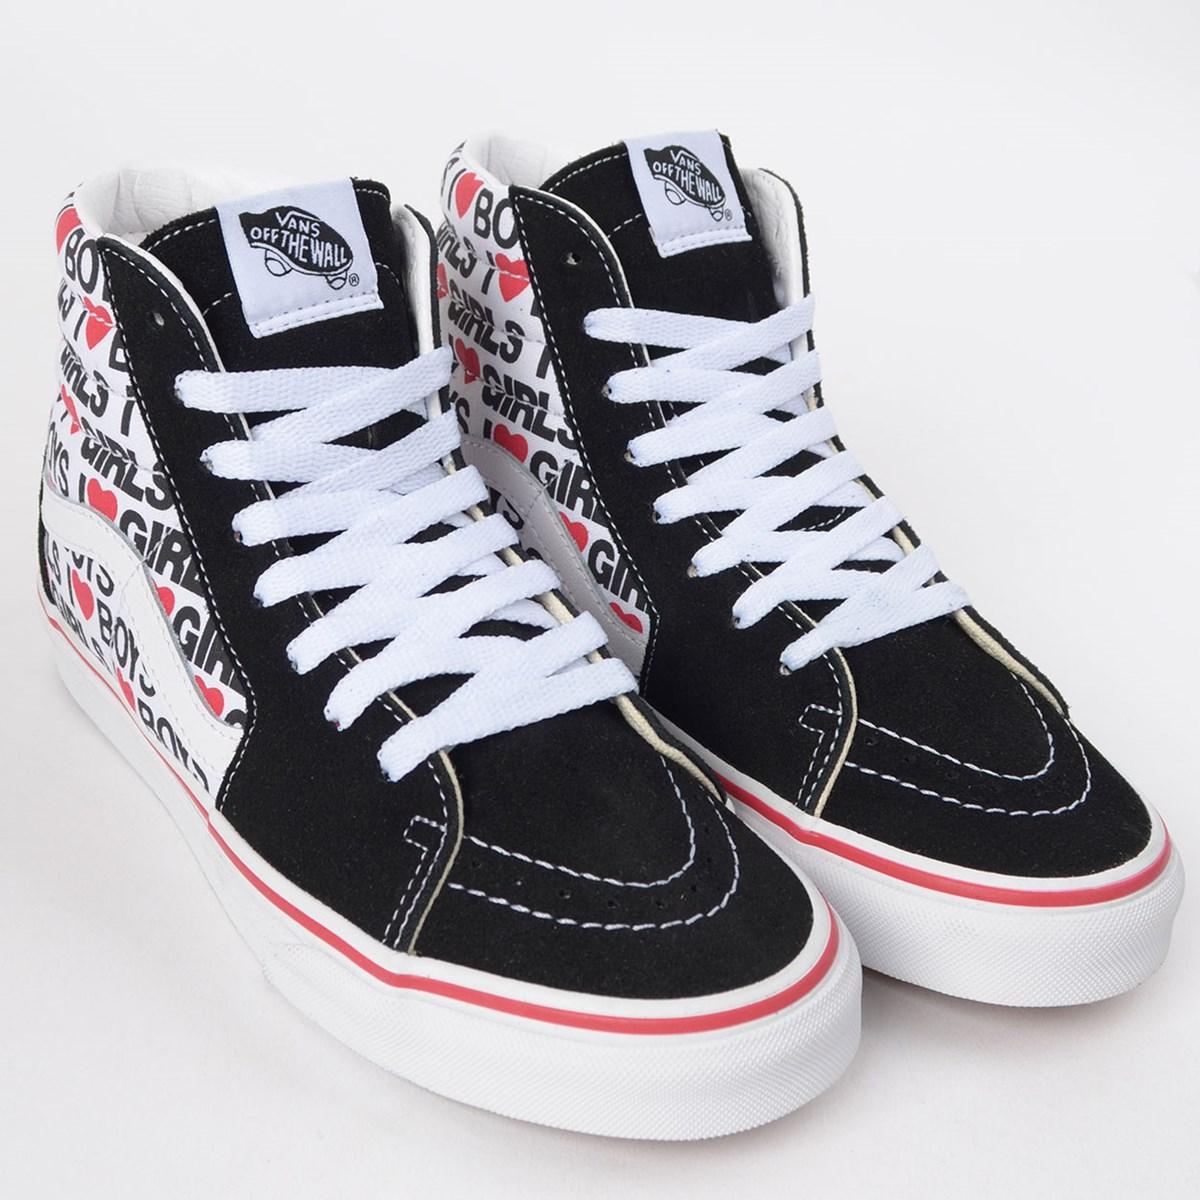 Tênis Vans Sk8 Hi I Heart Black True White VN0A4U3CWKU